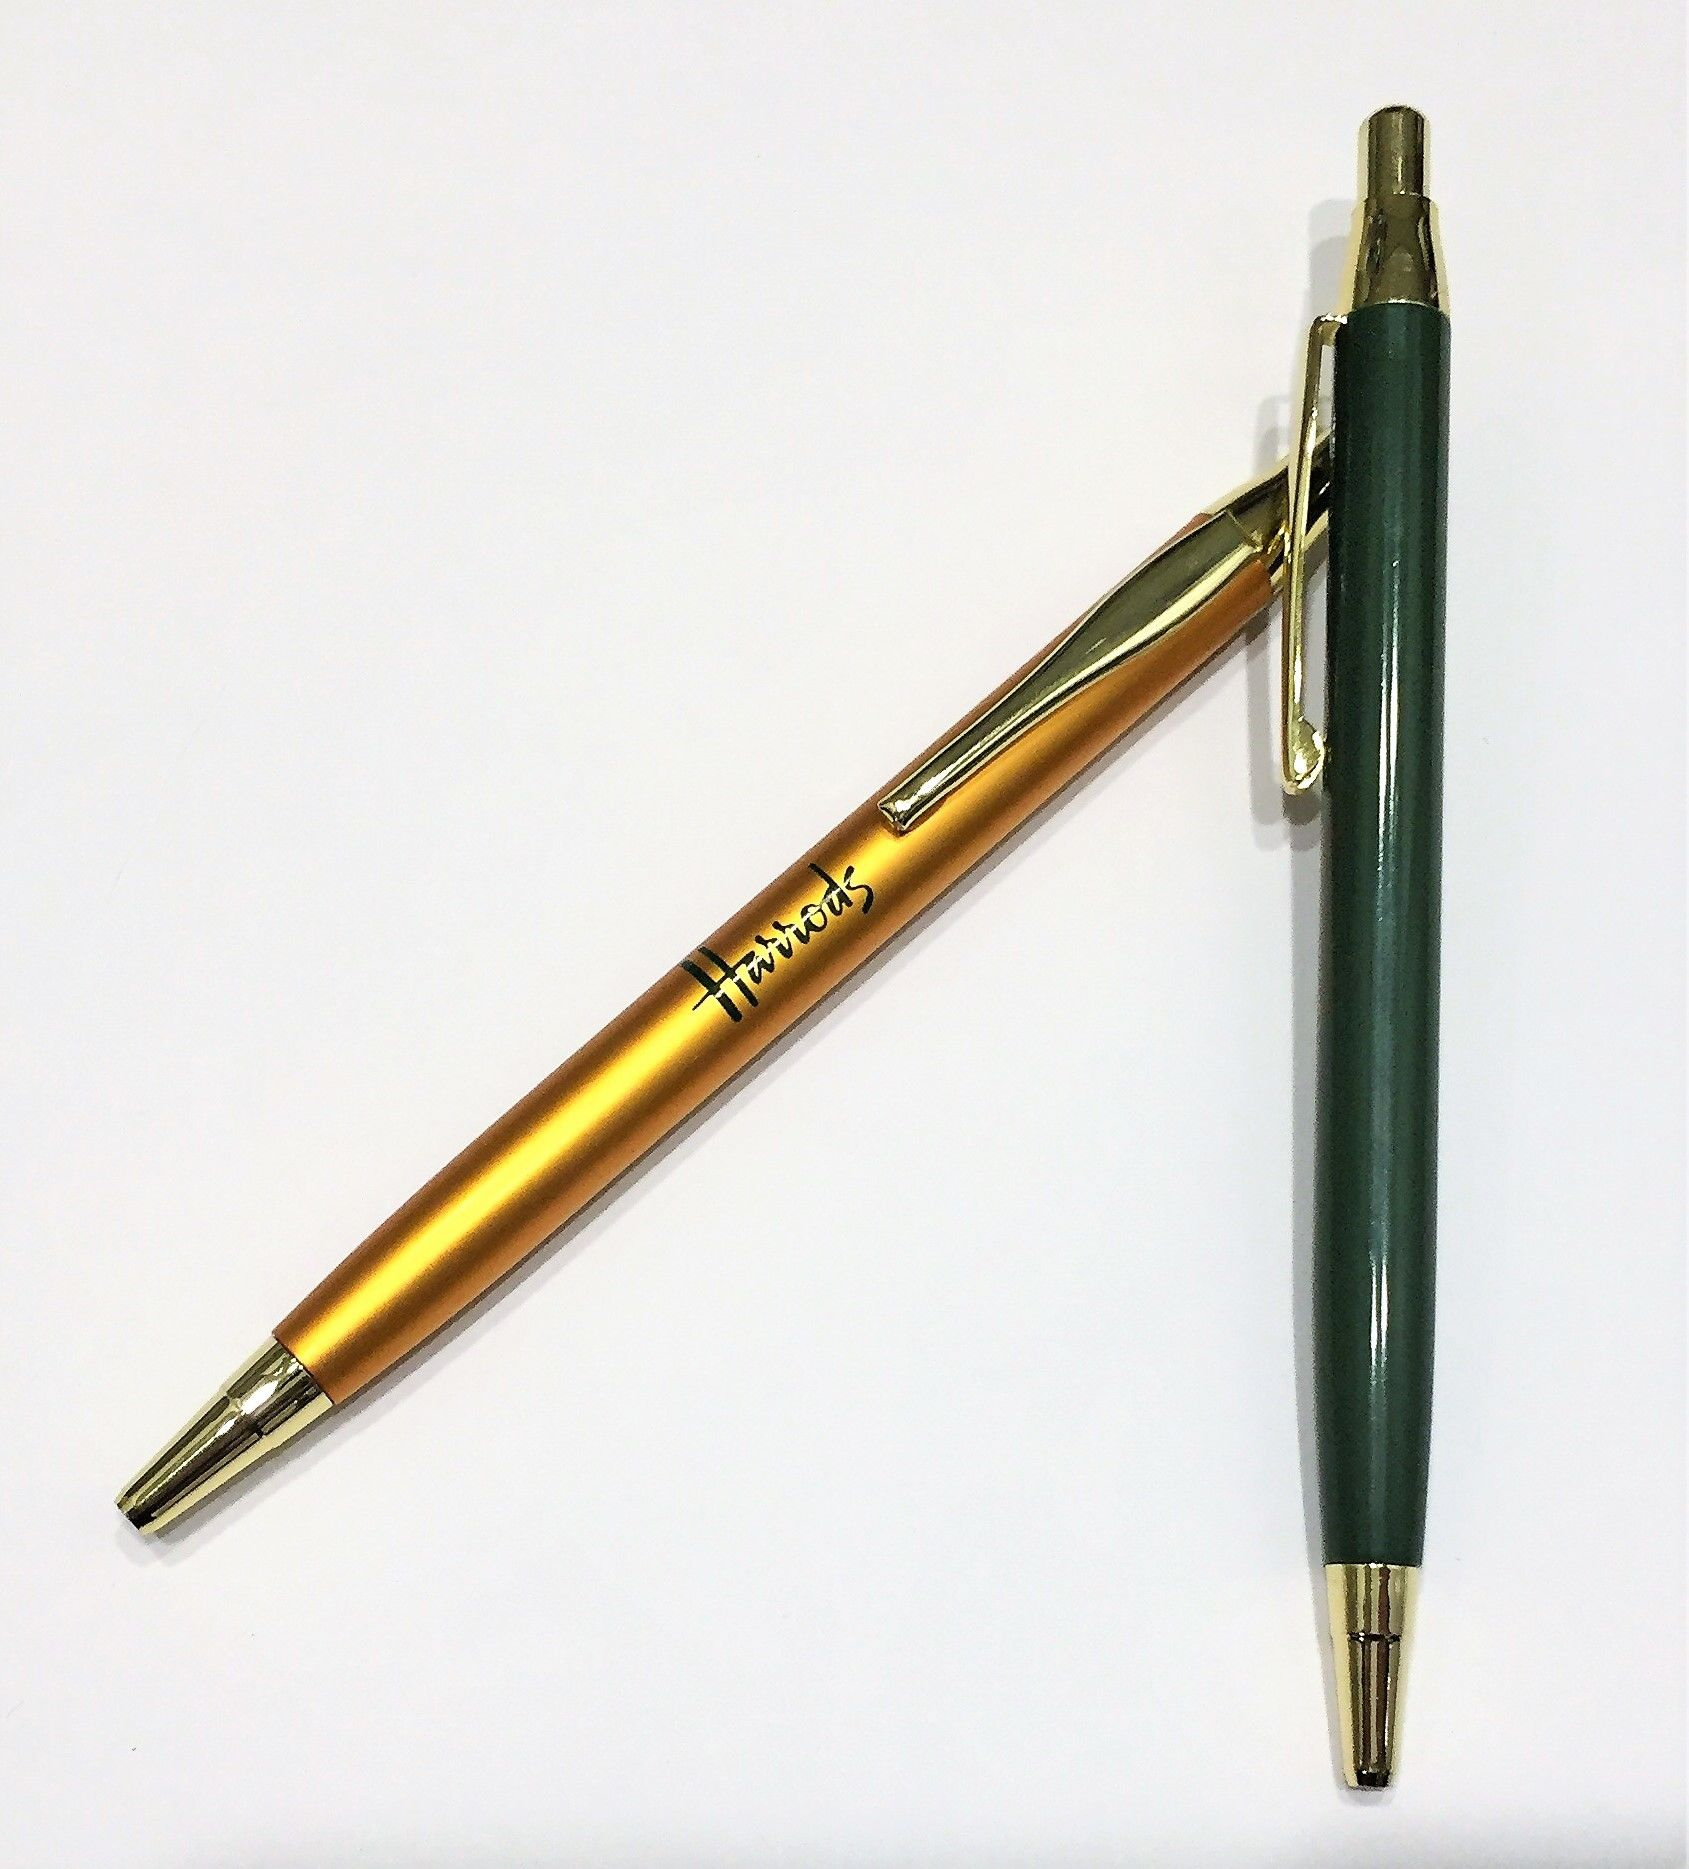 [Harrods] ハロッズ ボールペン / Harrods Logo Ball Pen